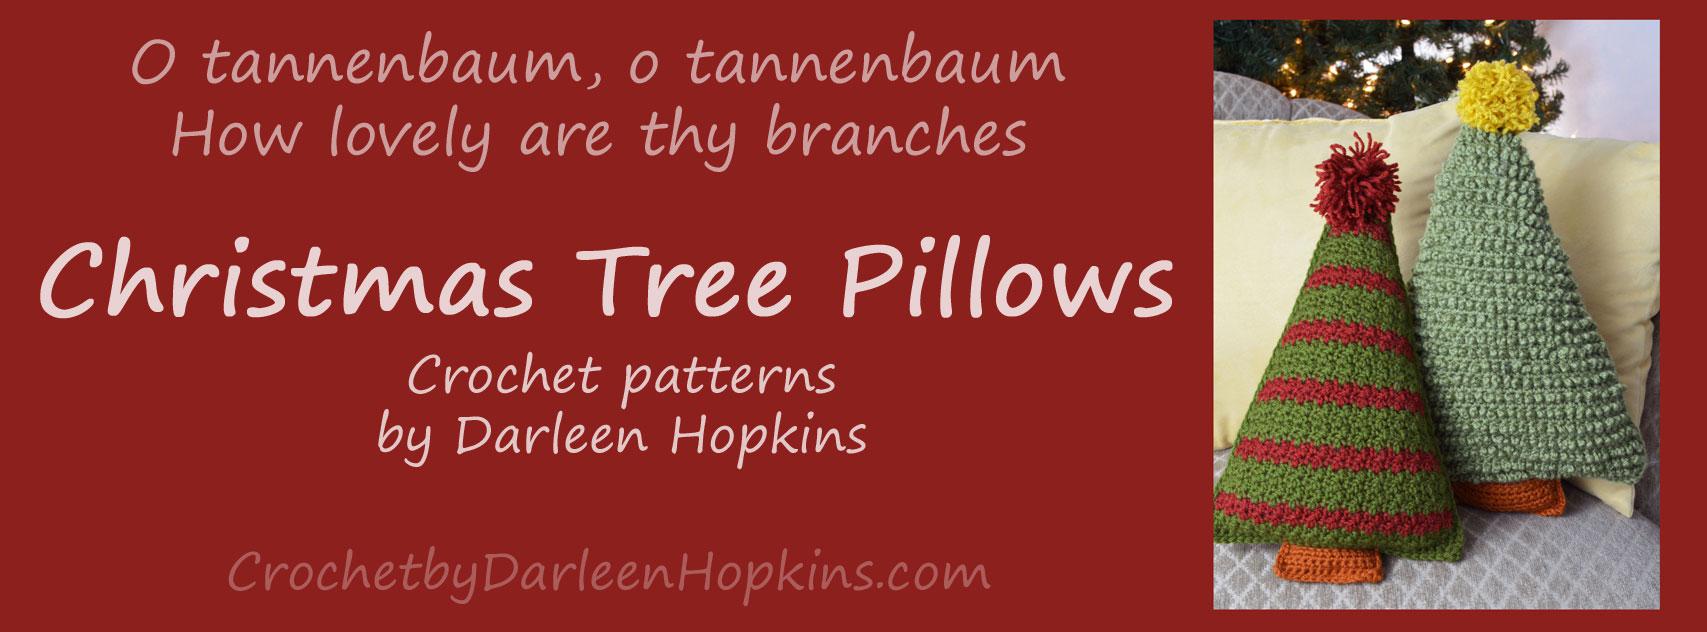 Christmas-Tree-Pillows-crochet-pattern-by-Darleen-Hopkins-1